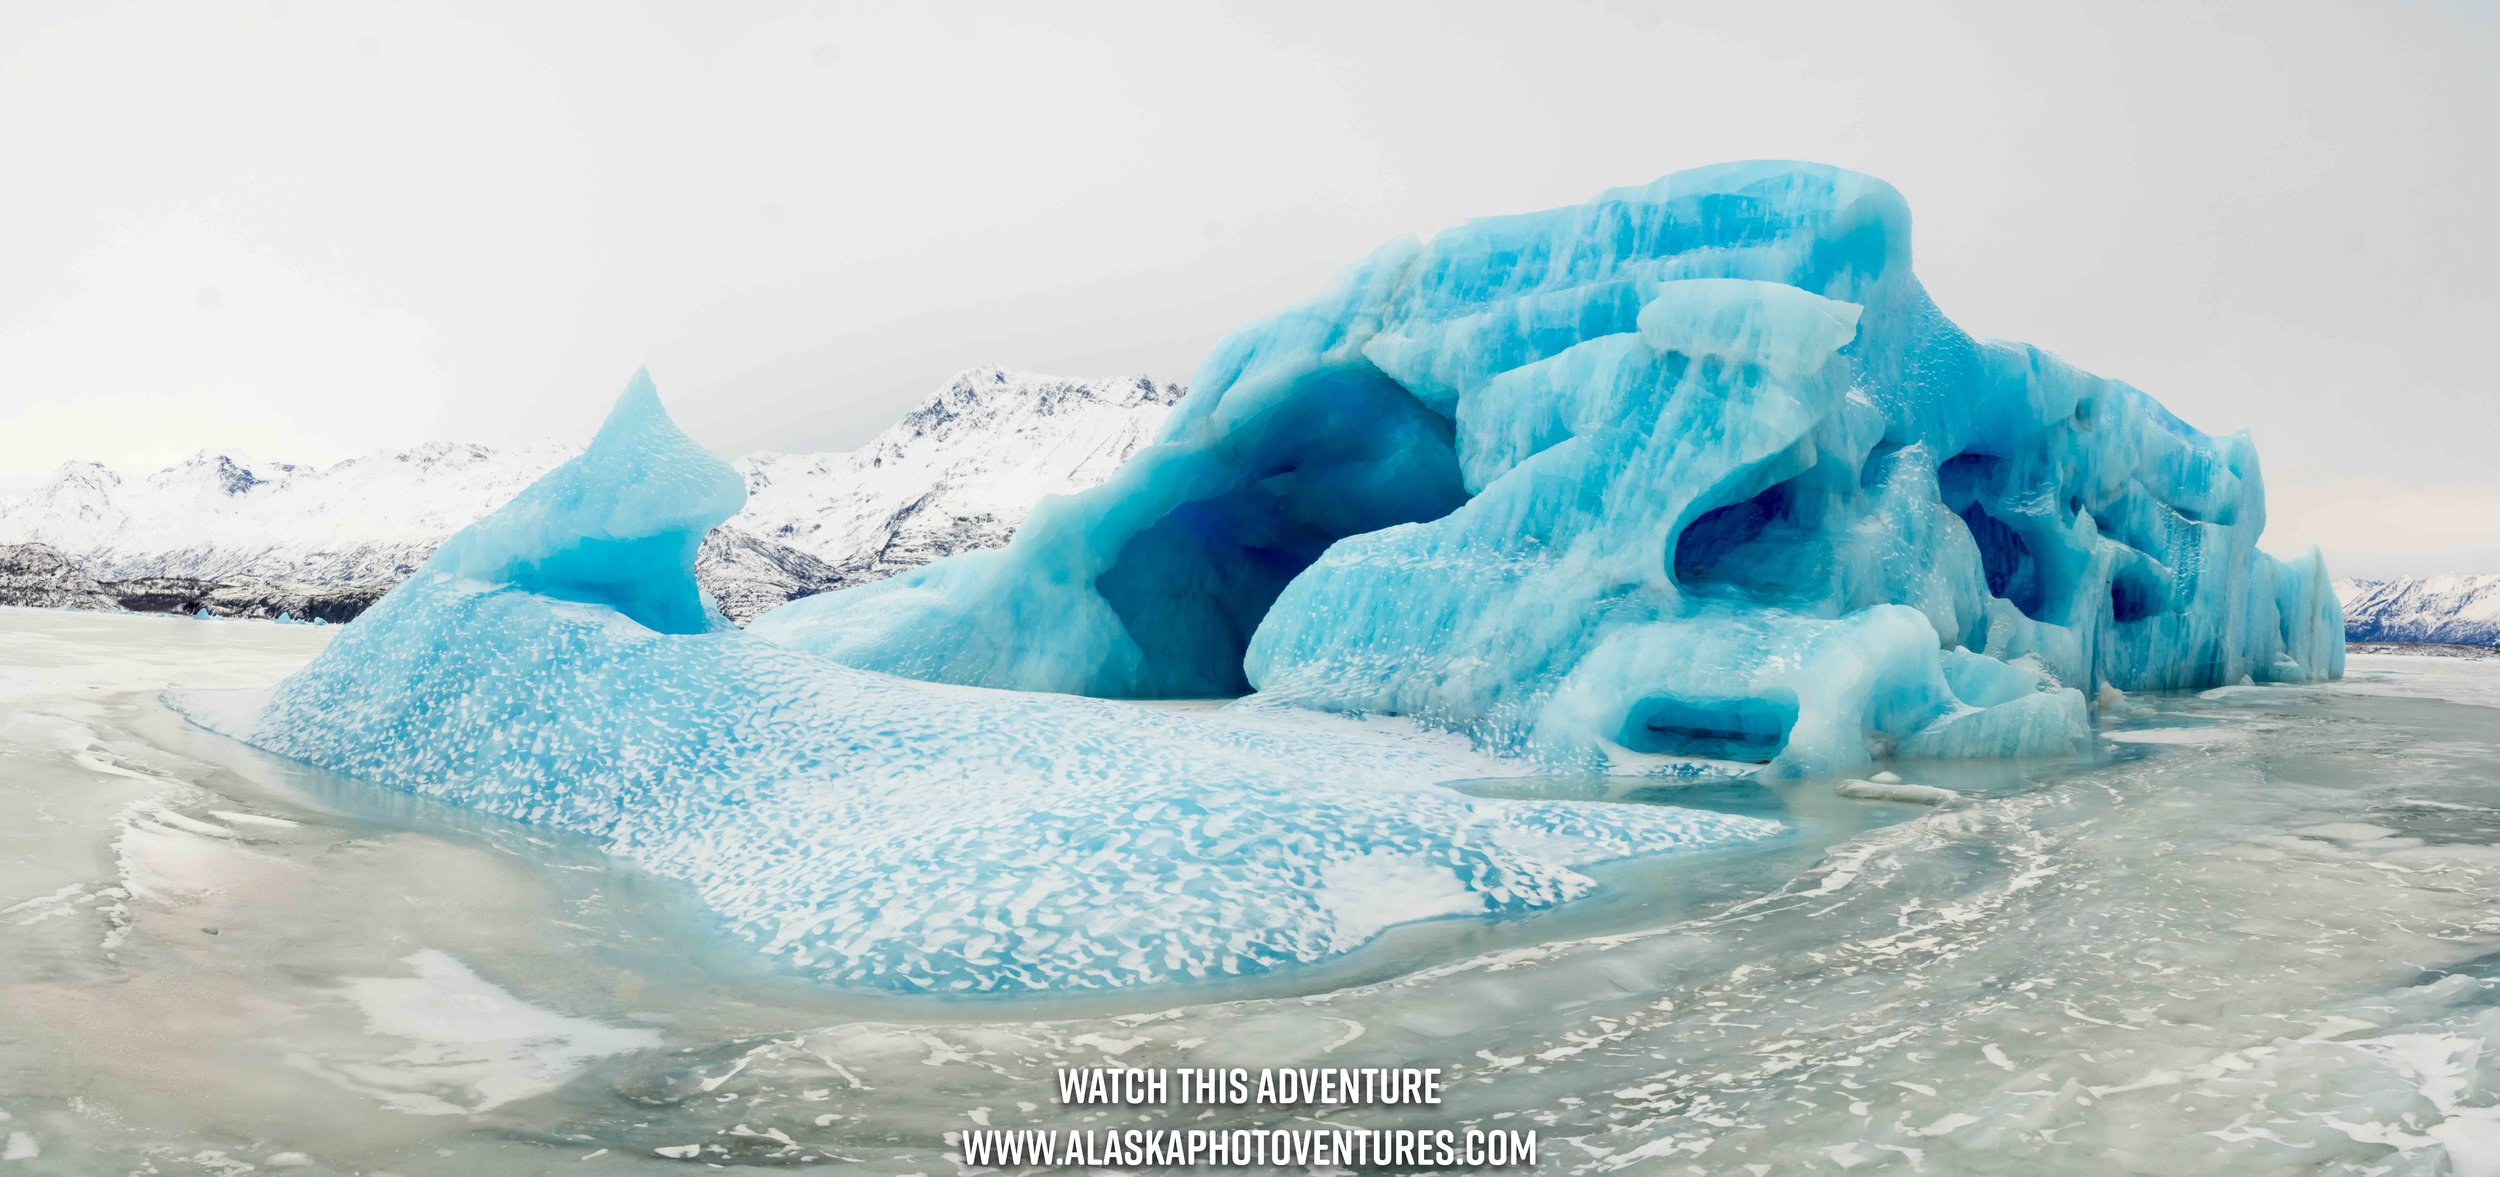 colony-glacier-adventure-photography-tv-show-alaska.jpg9.jpg